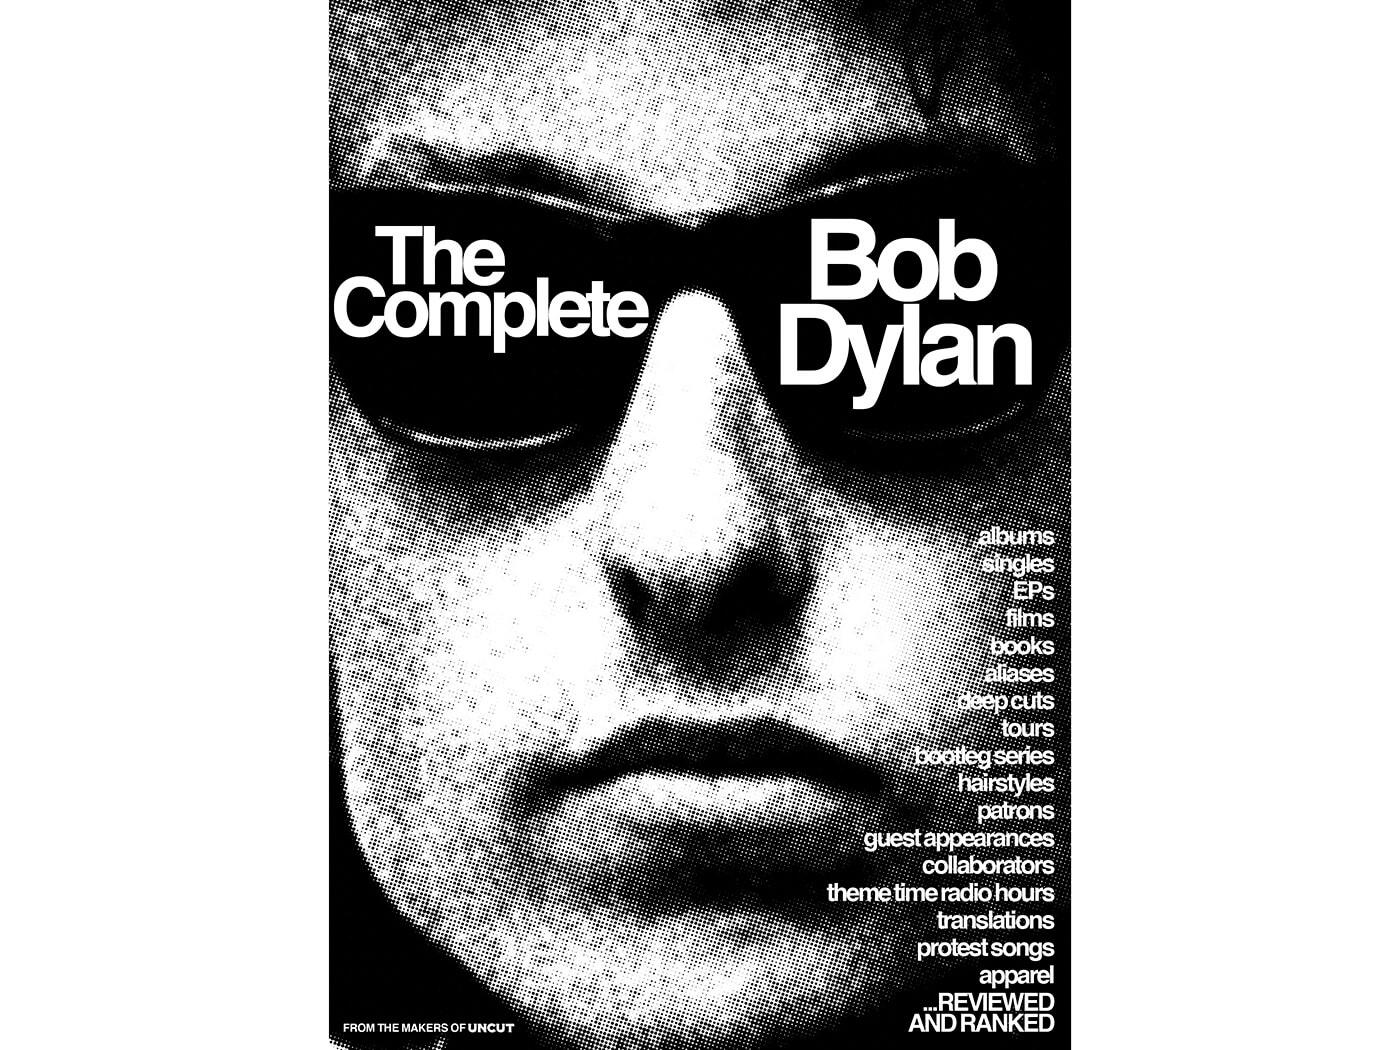 Complete Bob Dylan